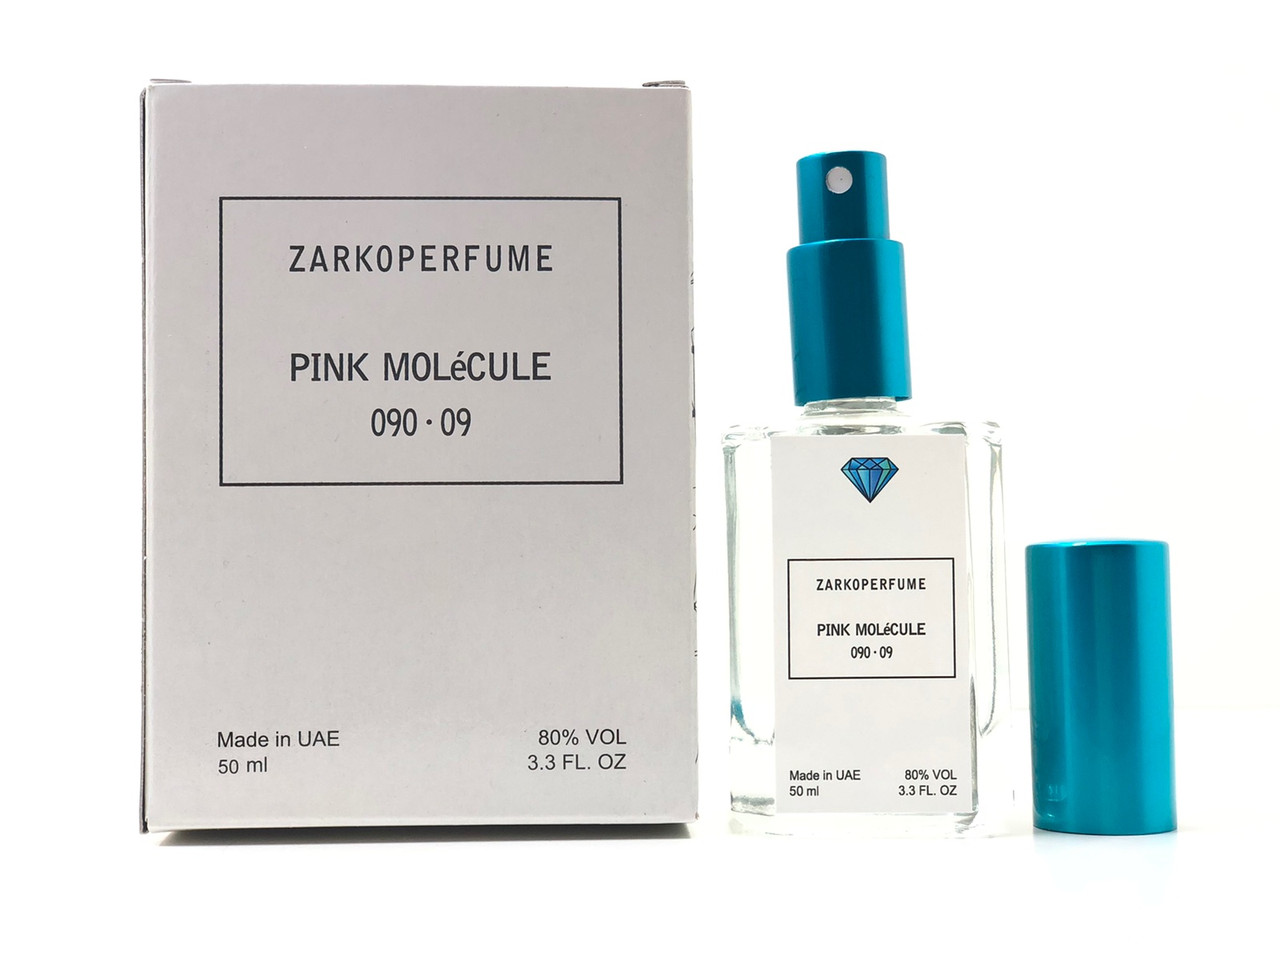 Парфюм Zarkoperfume Pink Molécule 090.09 (Заркоперфюм Пинк Молекула) 50 мл Diamond - реплика